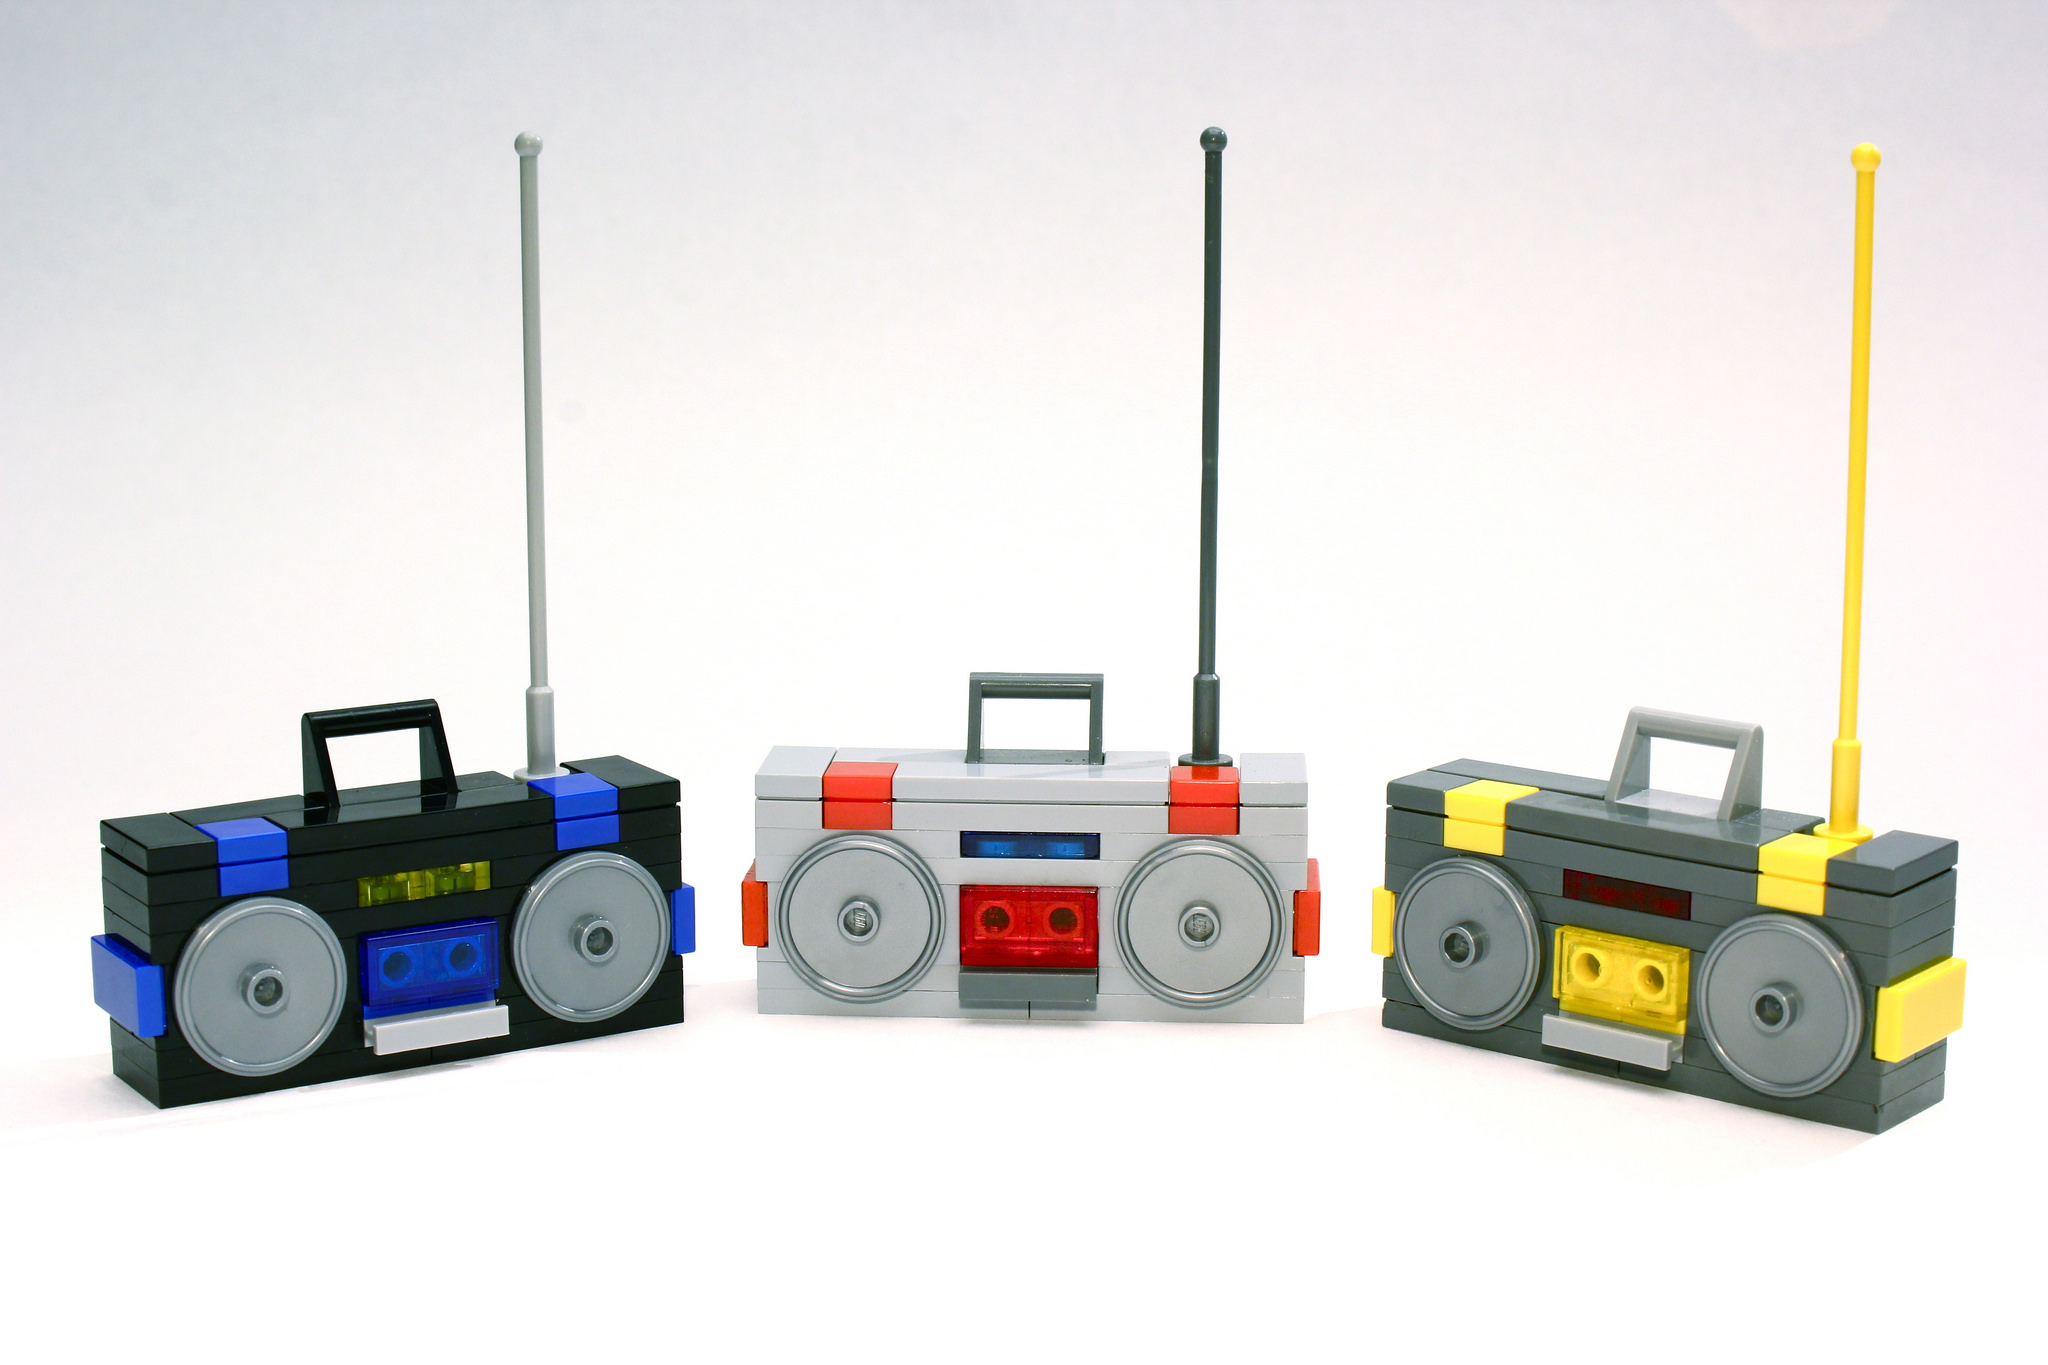 cassette_players_01